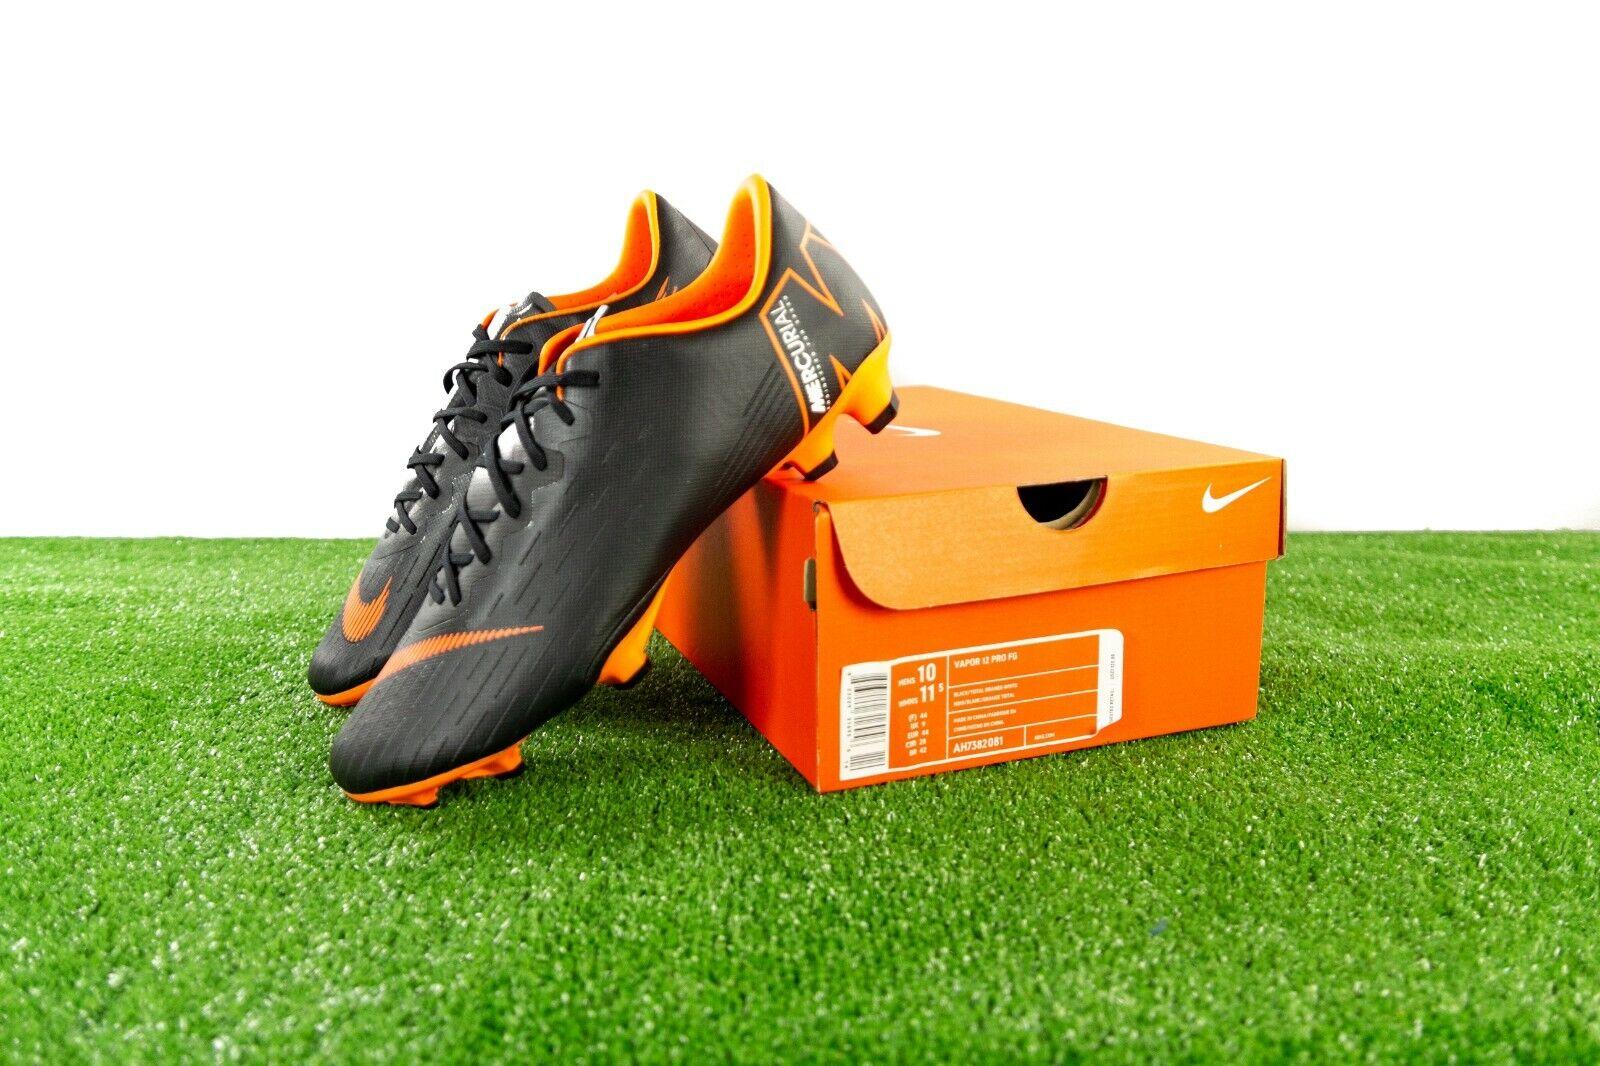 5327497dd Nike Mercurial Vapor 12 Pro FG Soccer Cleat Ah7382 081 Size 9.5 ...